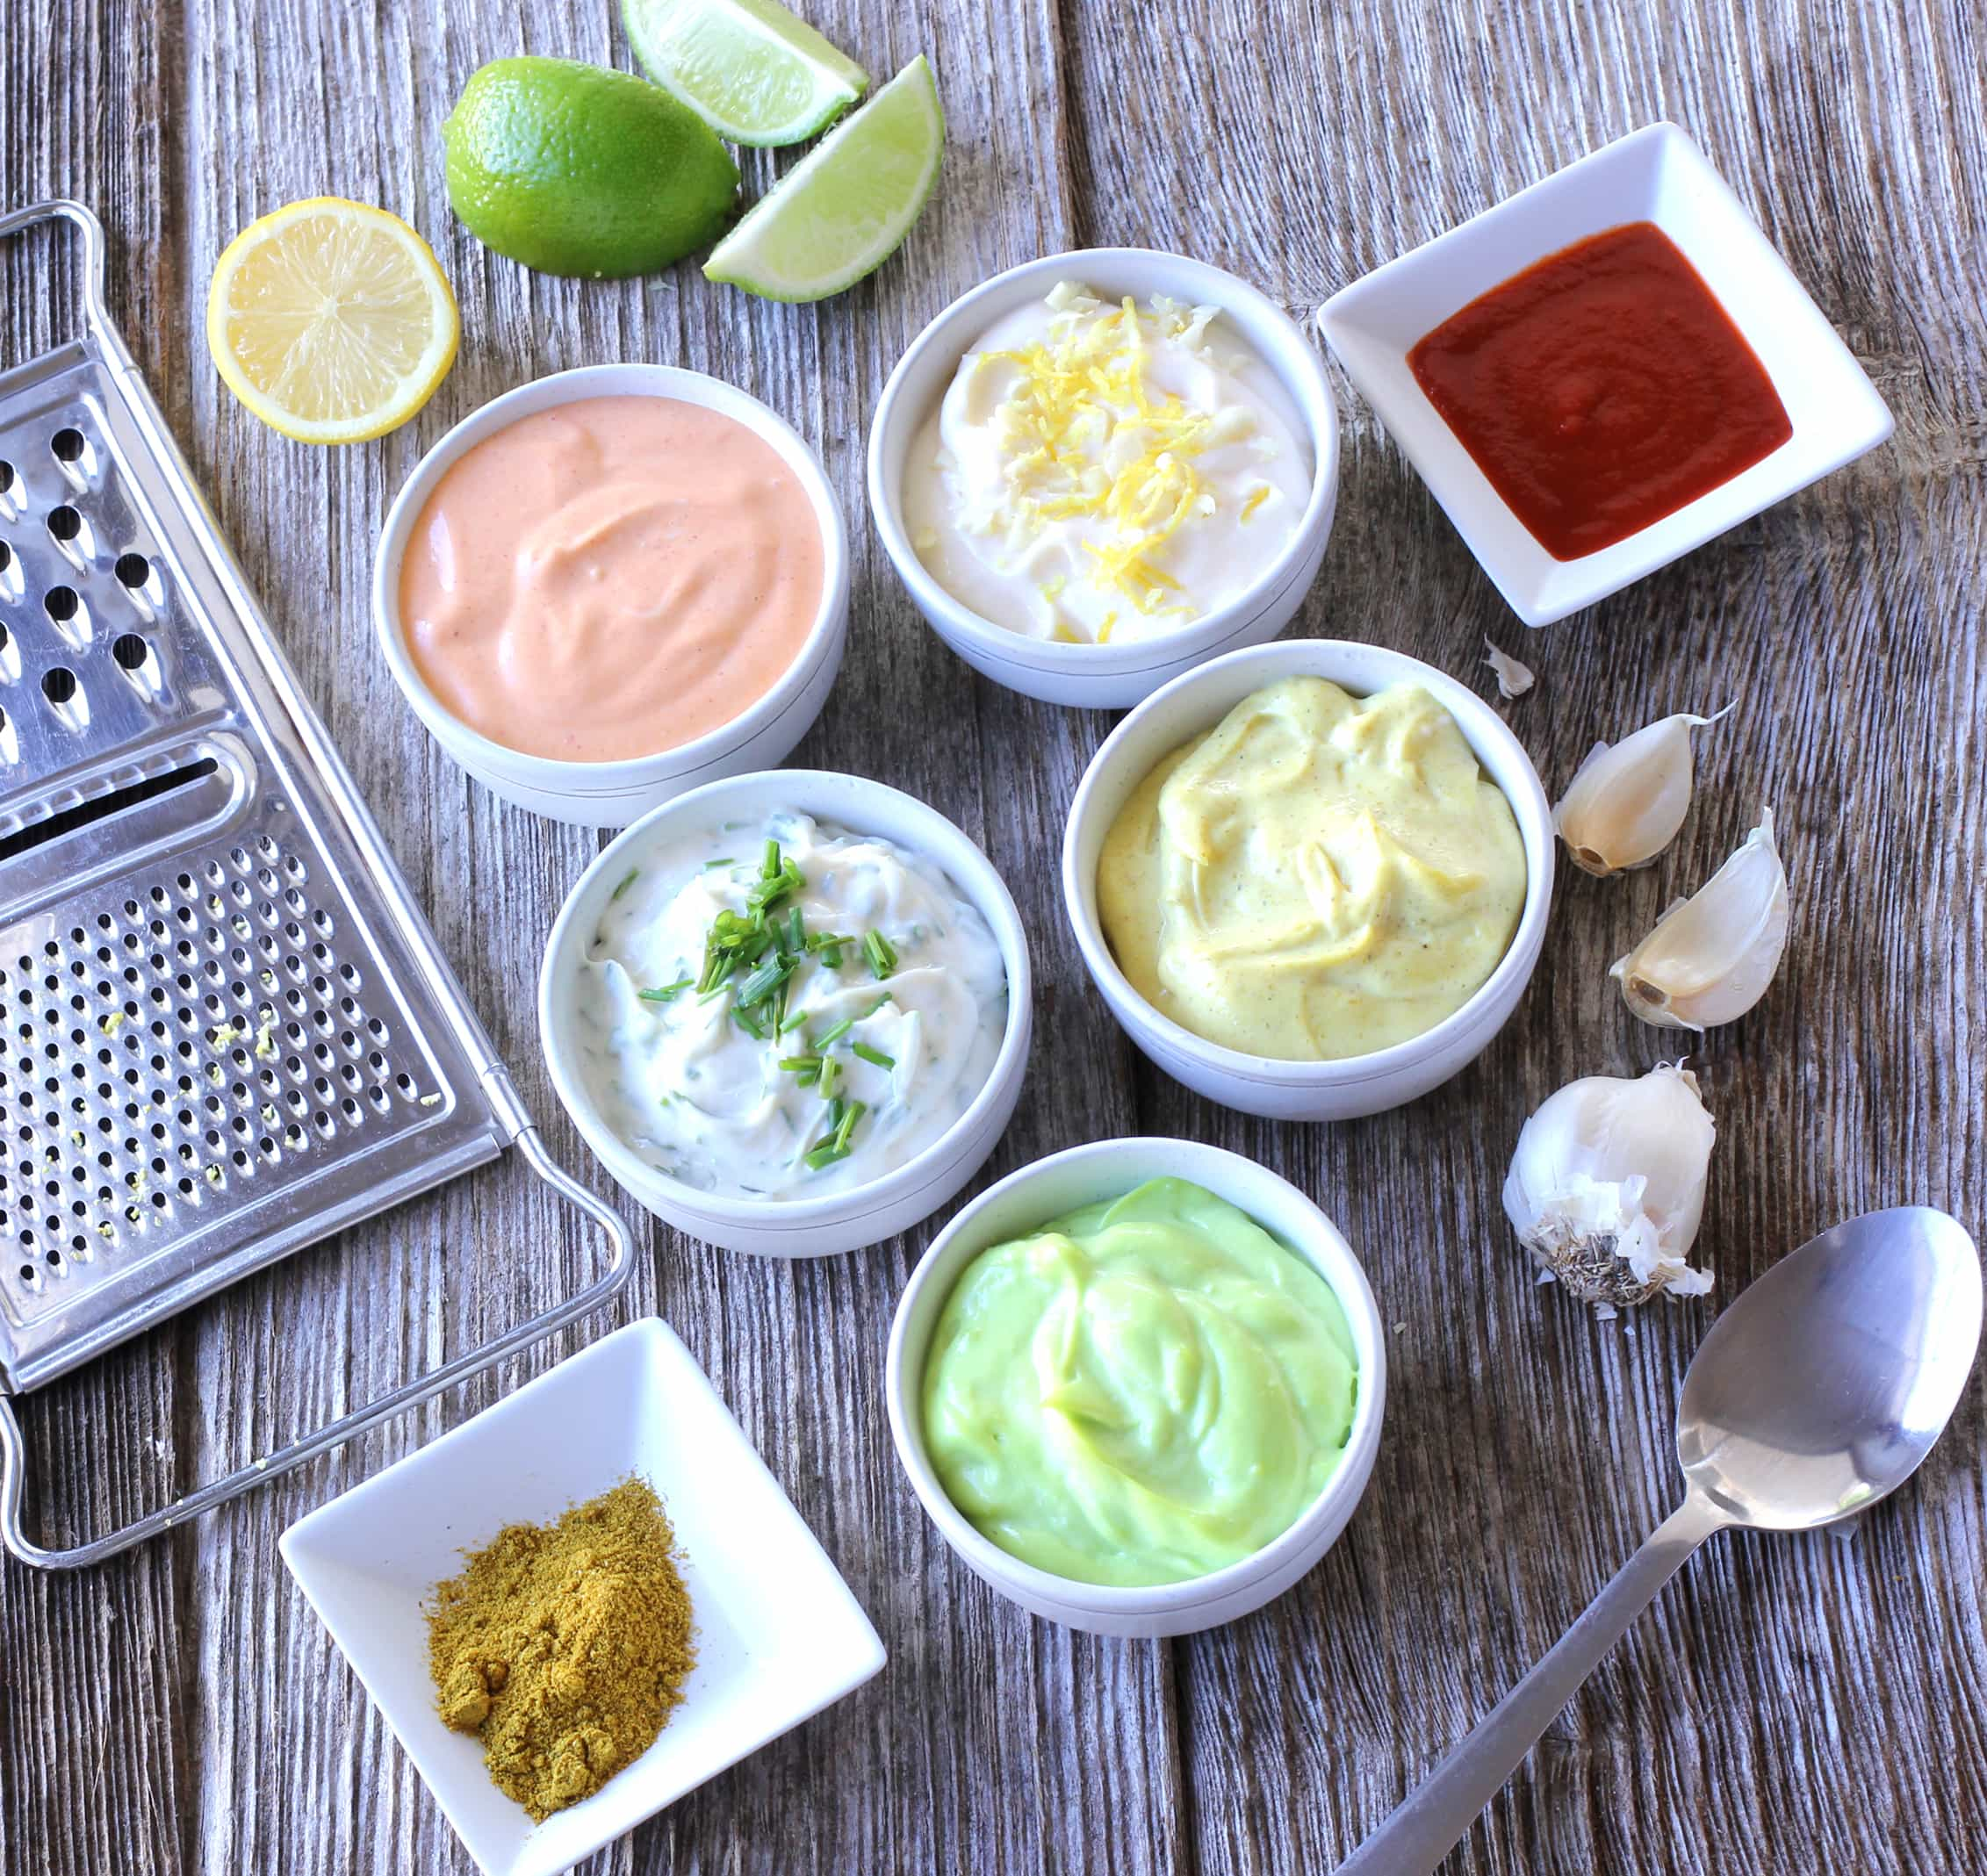 hellman's carefully crafted mayo